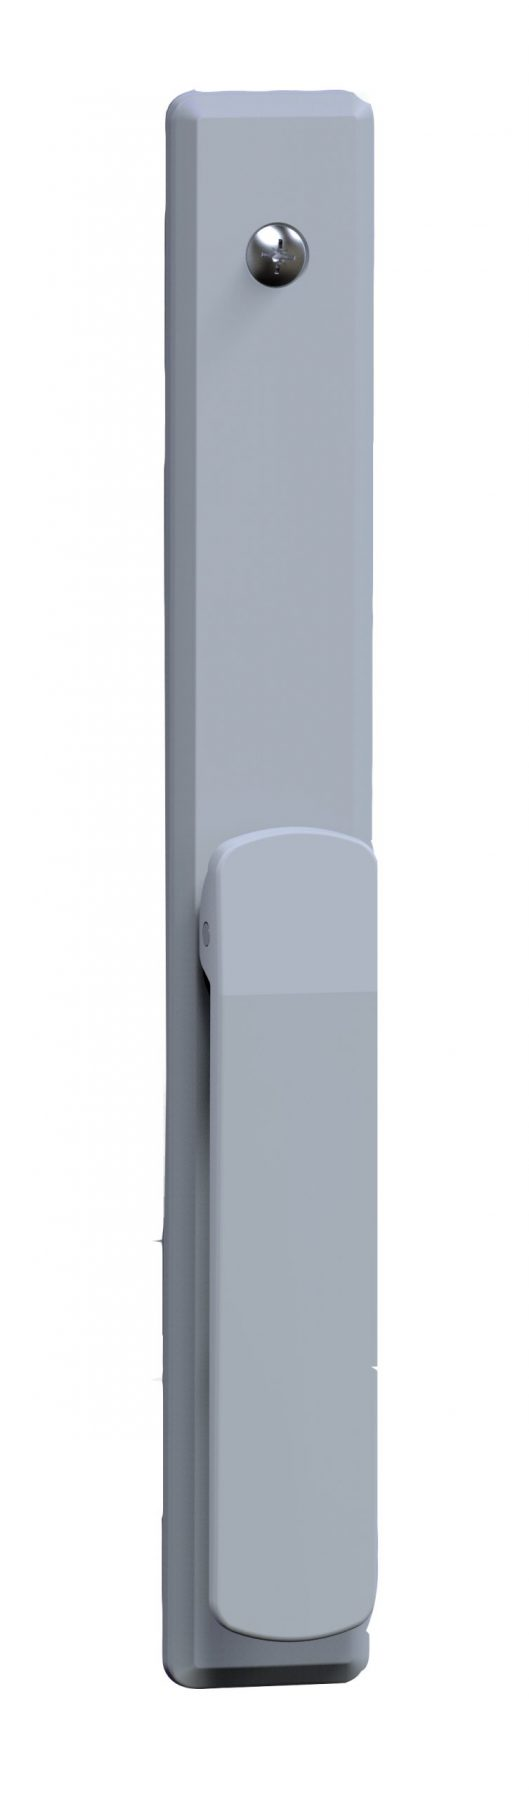 Twin Point Flushbolt Non-Lockable